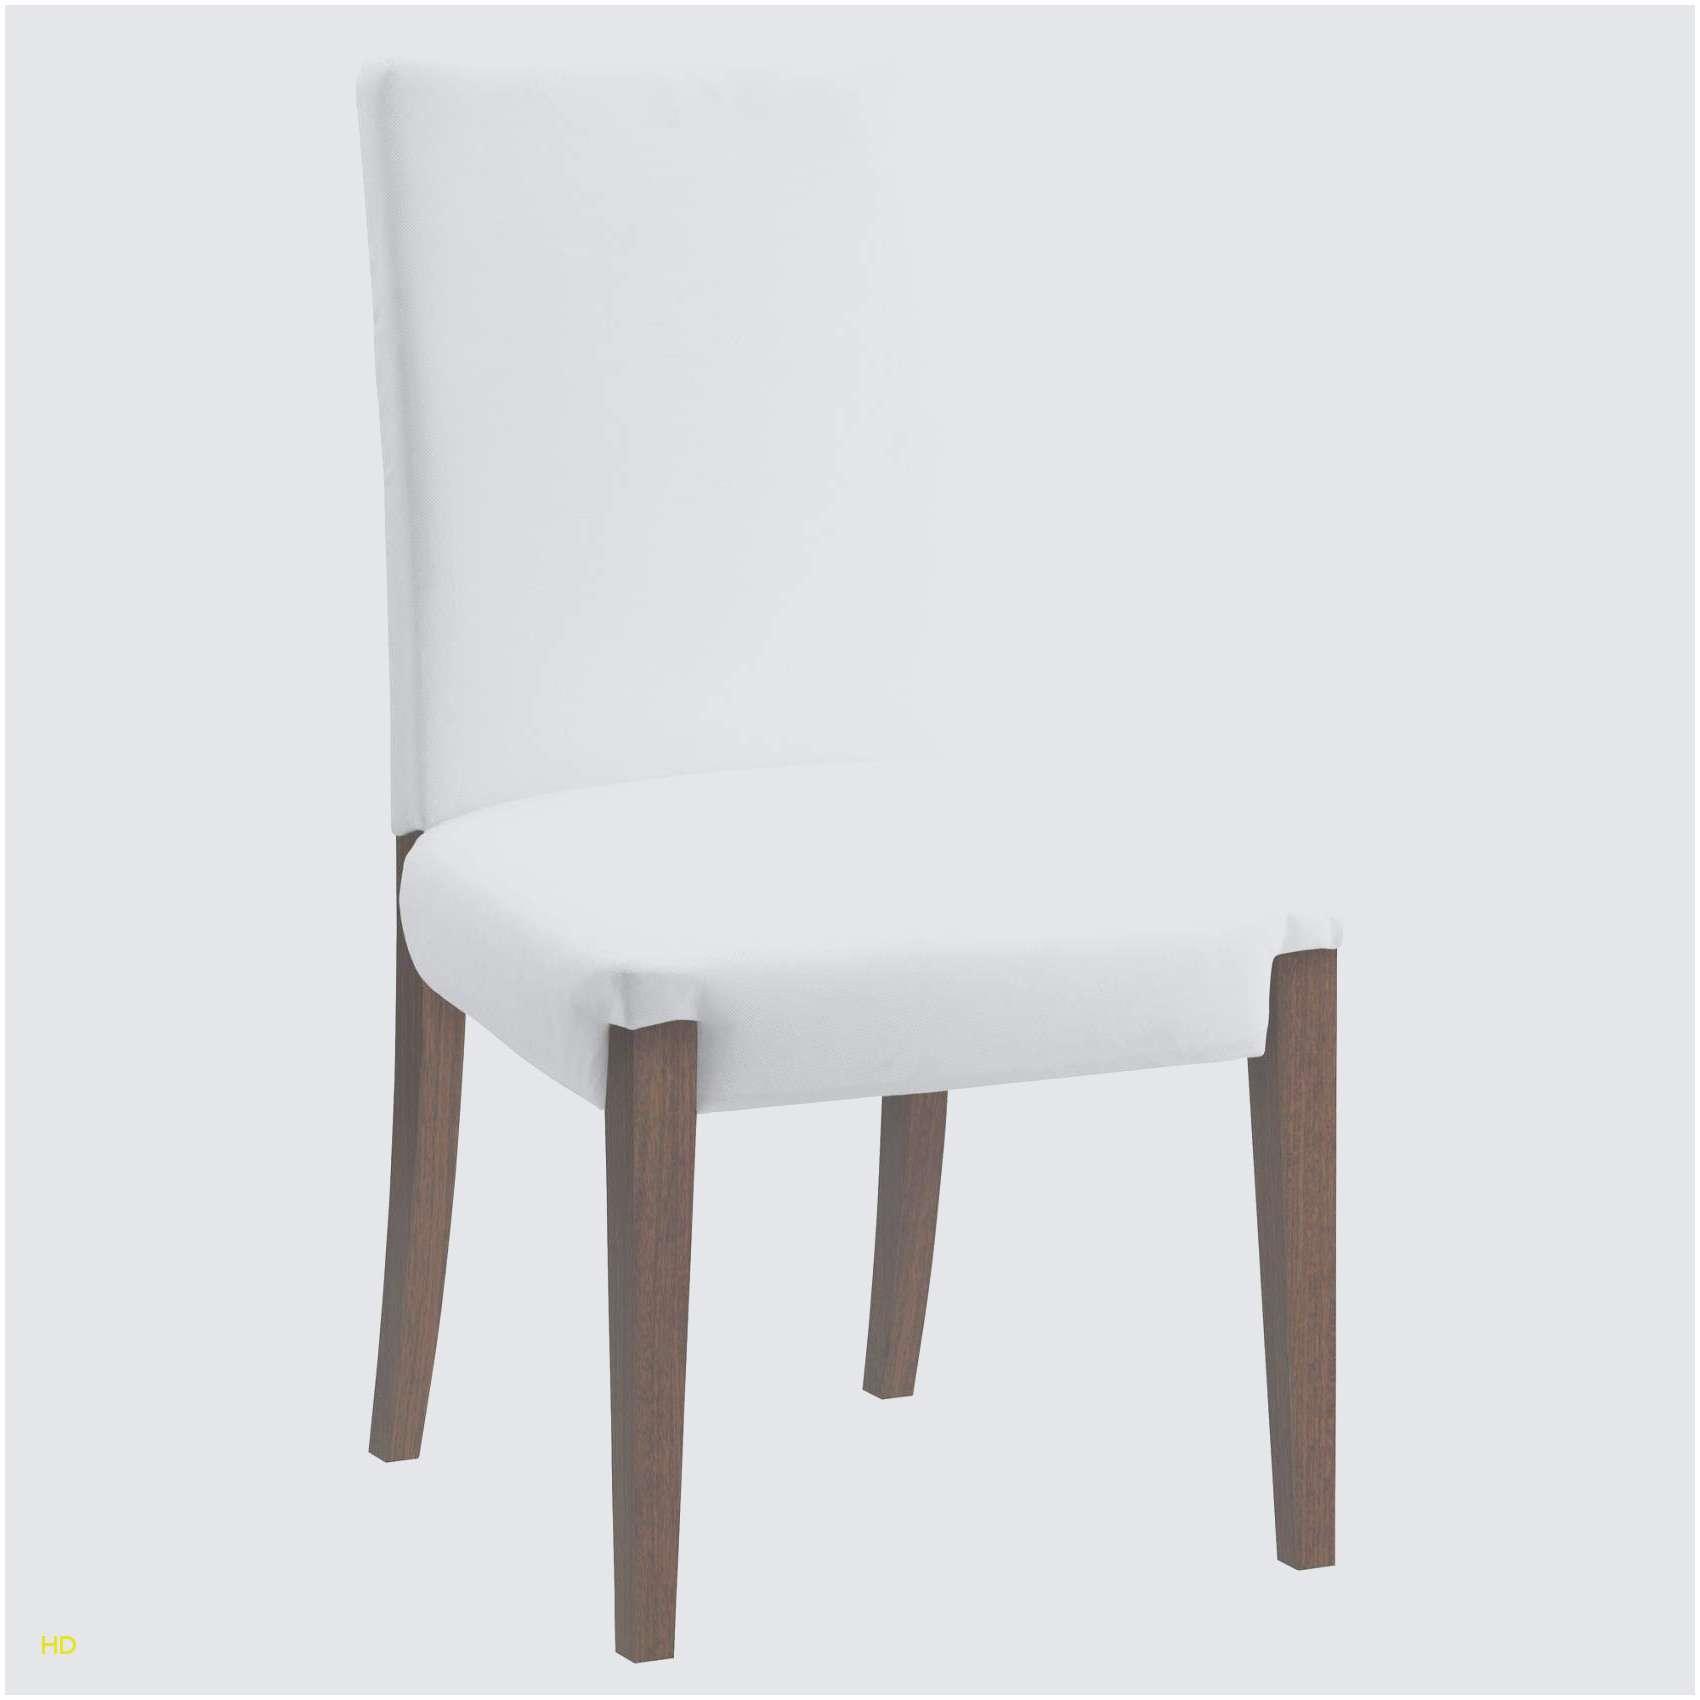 chaise bois ikea ikea chaise de cuisine chaises cuisine ikea nouveau chaise de cuisine ikea meilleur de ikea unique ikea chaise de cuisine chaise ikea cuisine cuisine fauteuil salon 0d pour